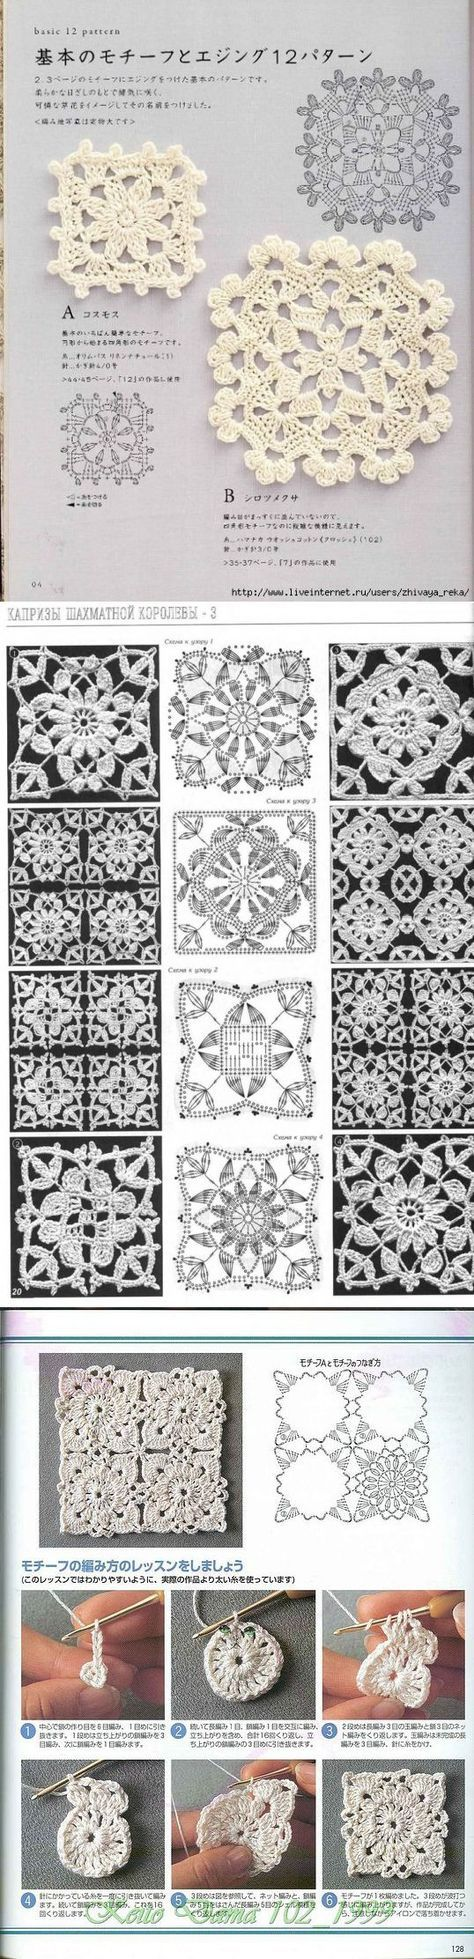 Mejores 619 imágenes de Crochet motivos en Pinterest